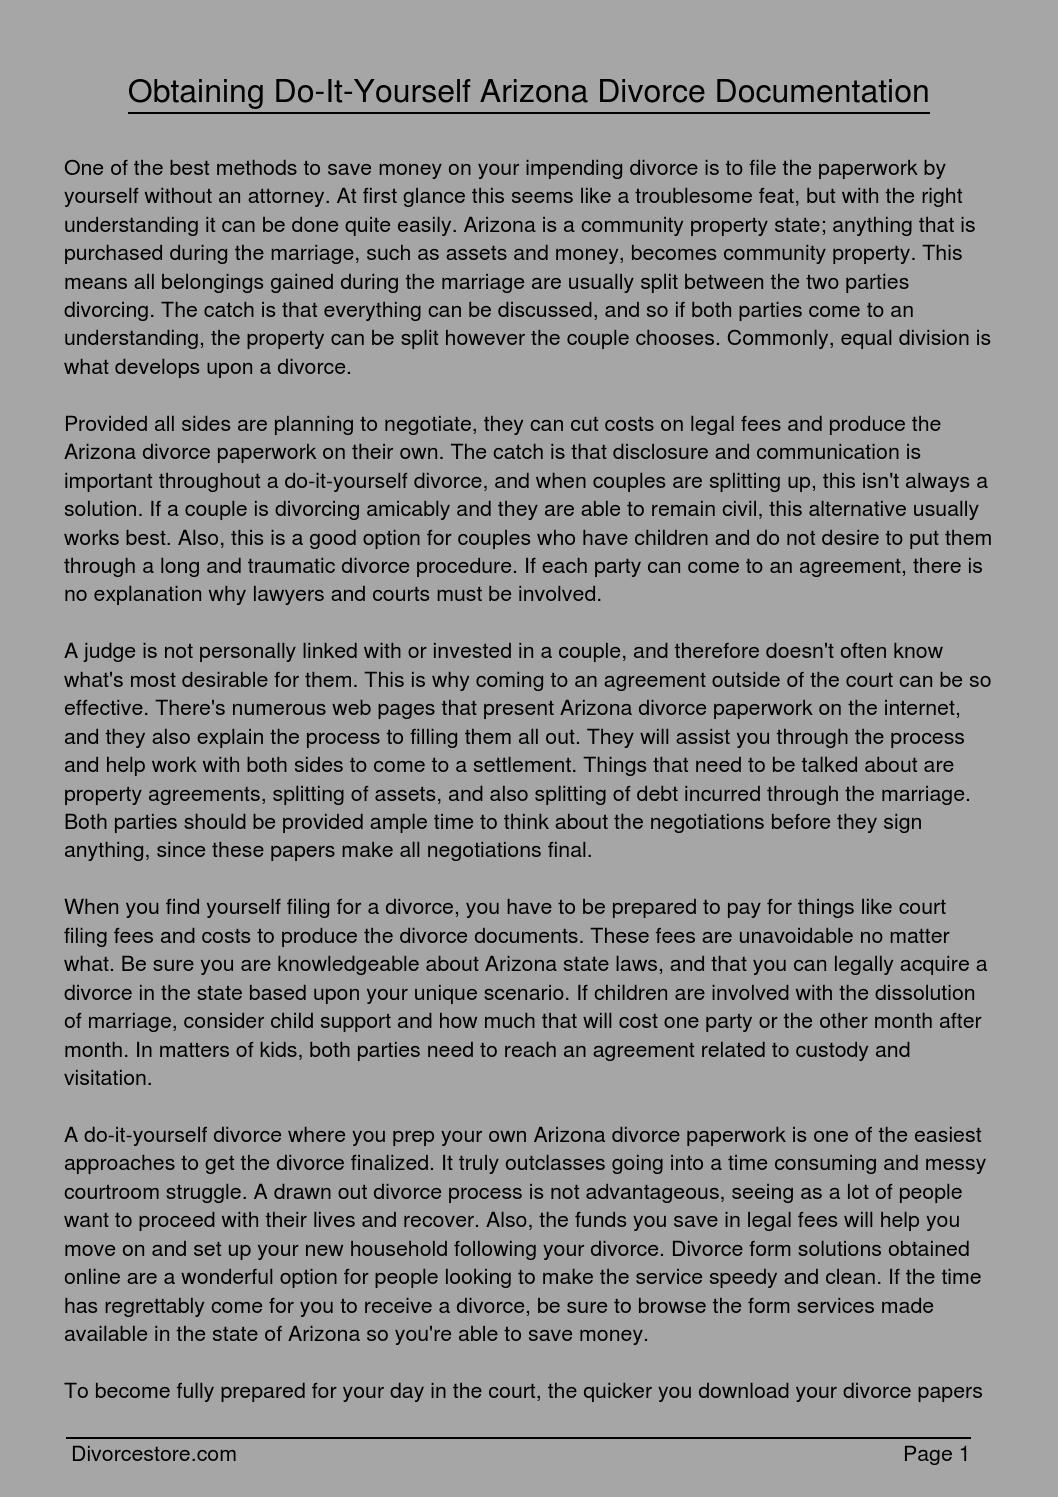 Obtaining do it yourself arizona divorce documentation by obtaining do it yourself arizona divorce documentation by jmelinda31100 issuu solutioingenieria Gallery